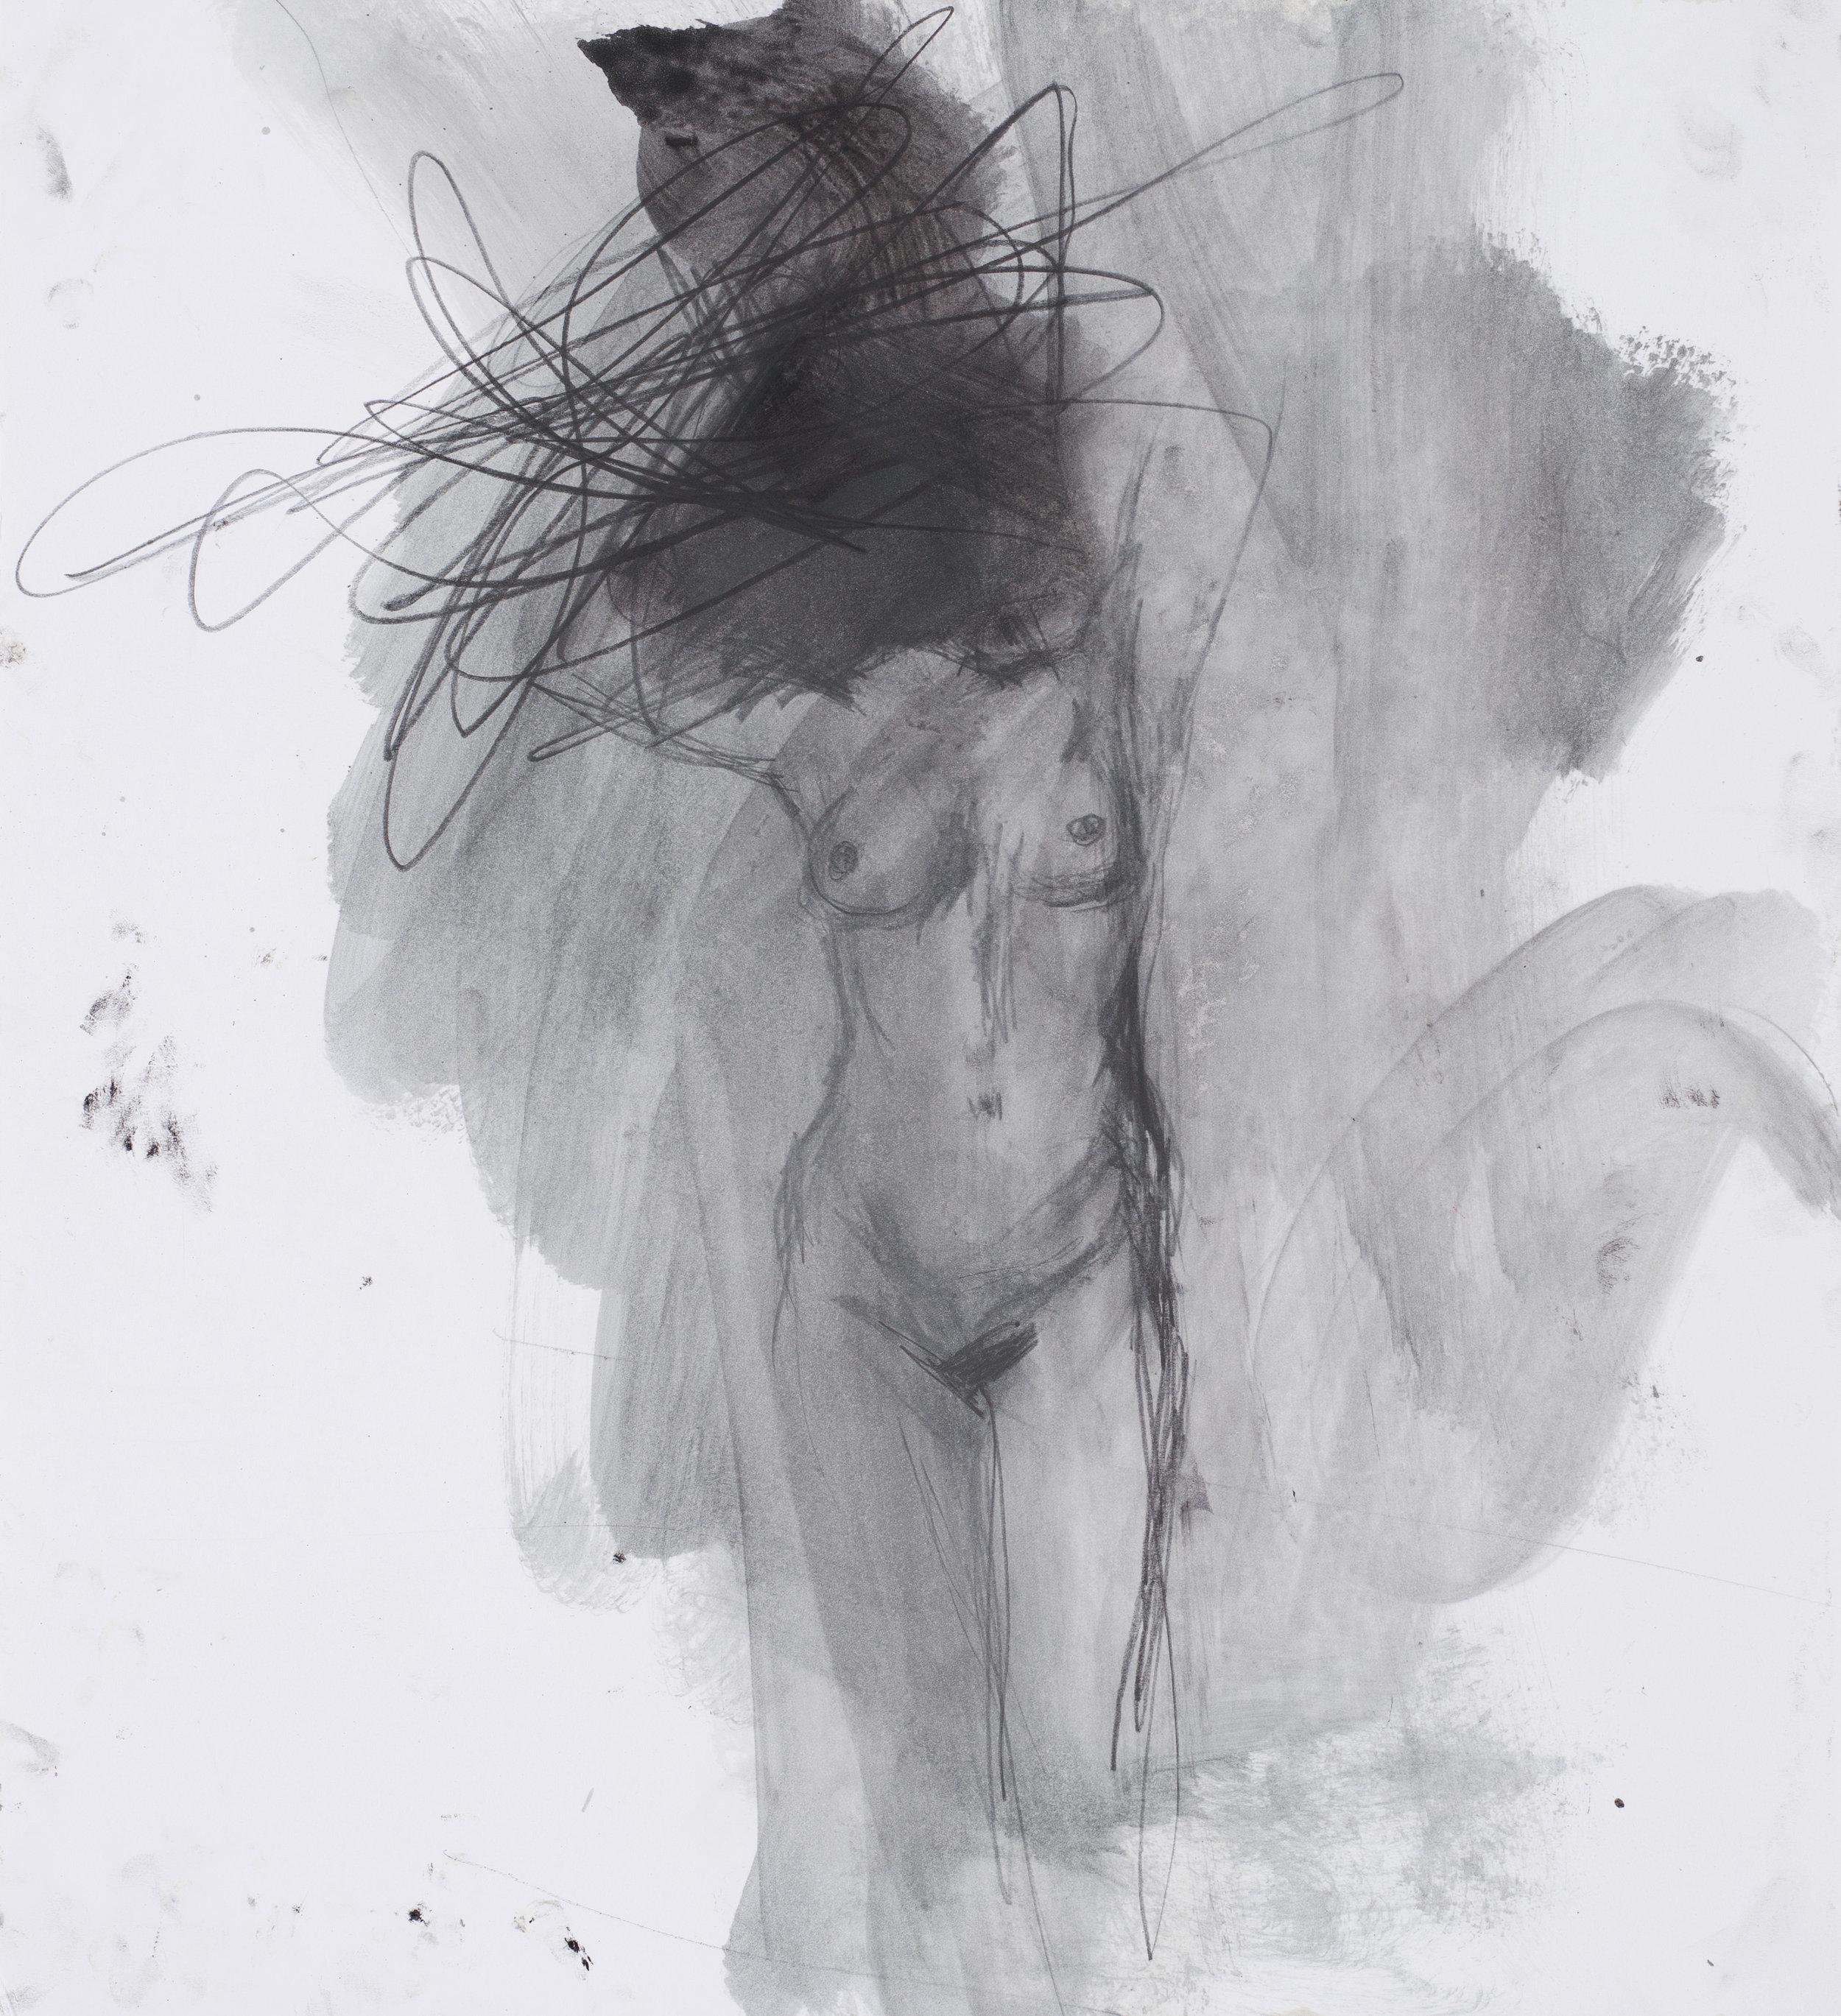 Eros couronné de roses 7 - 201745,5 x 50 cm